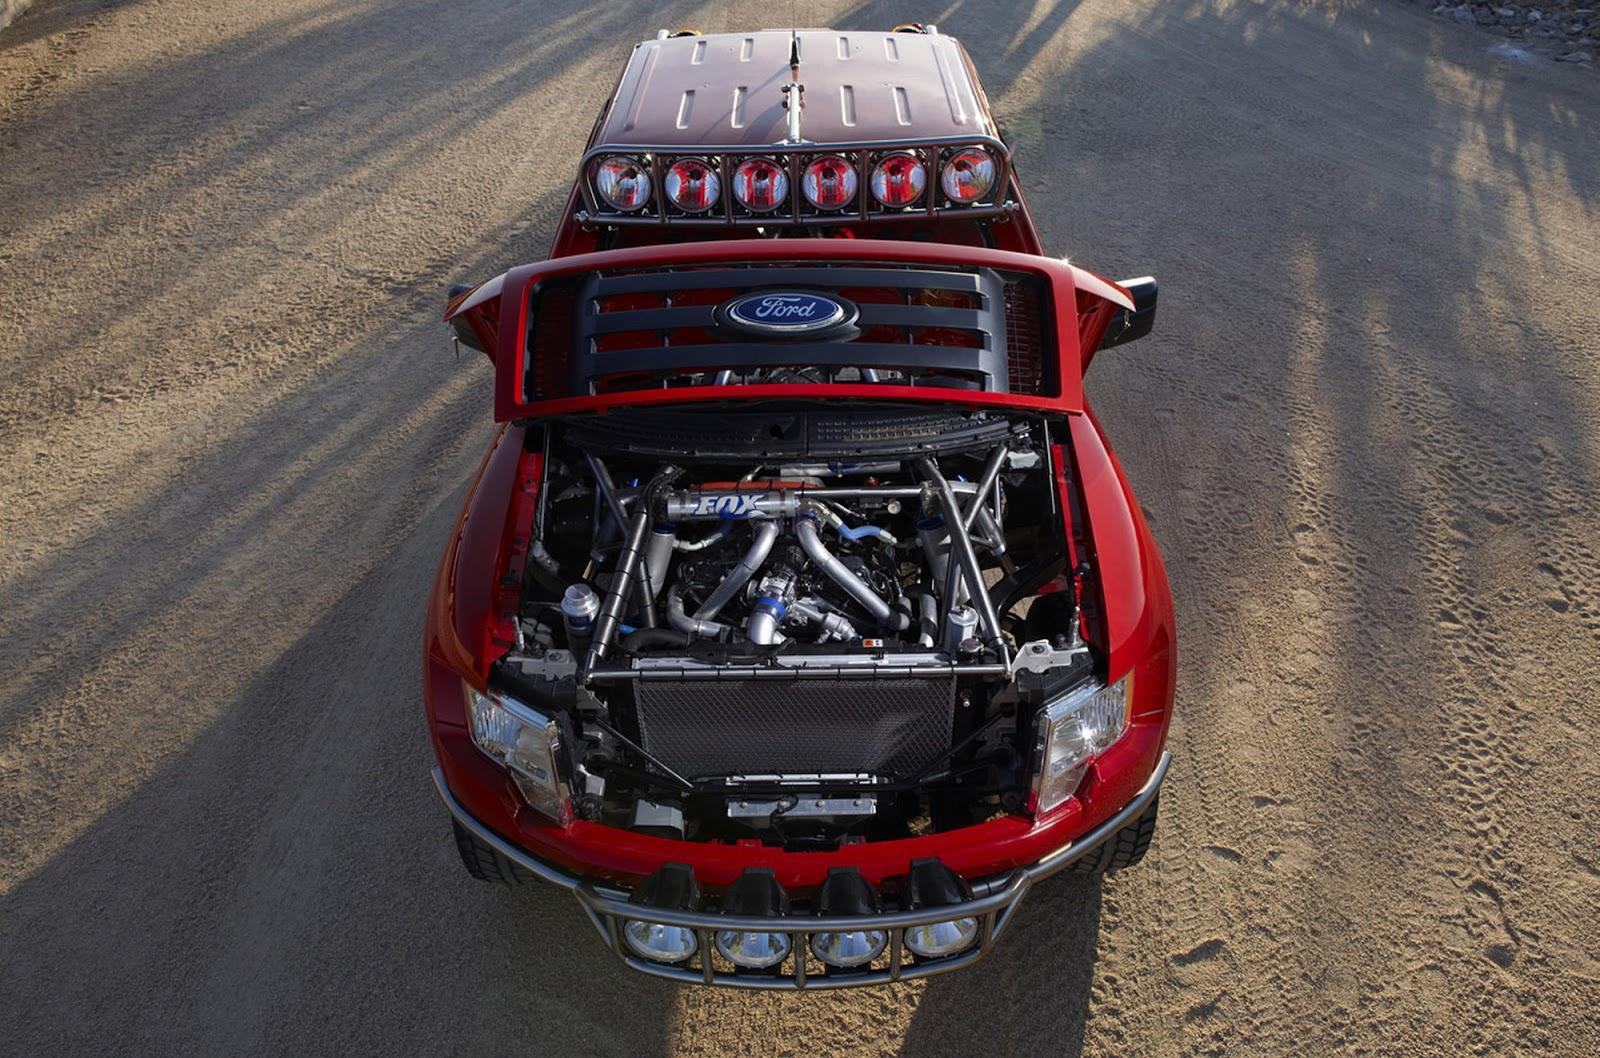 medium resolution of ford s f150 ecoboost engine under federal investigation